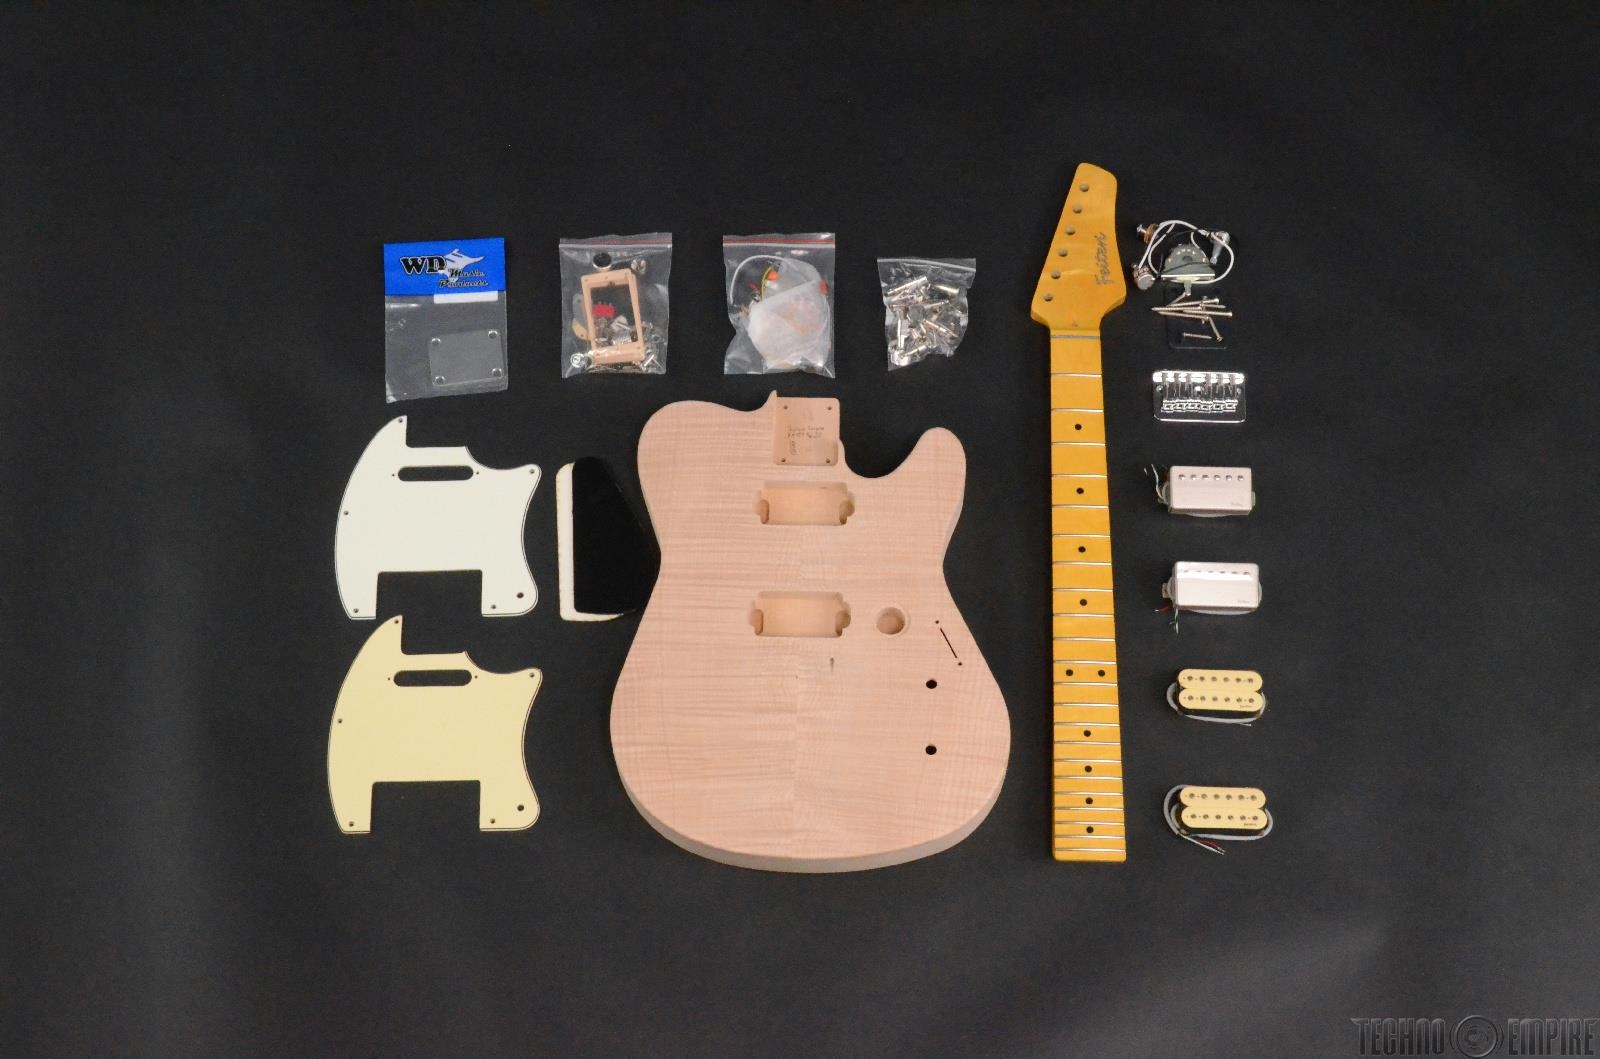 Buzz Feiten Gemini Blues Pro DLX Build Your Own Electric Guitar Kit #28420